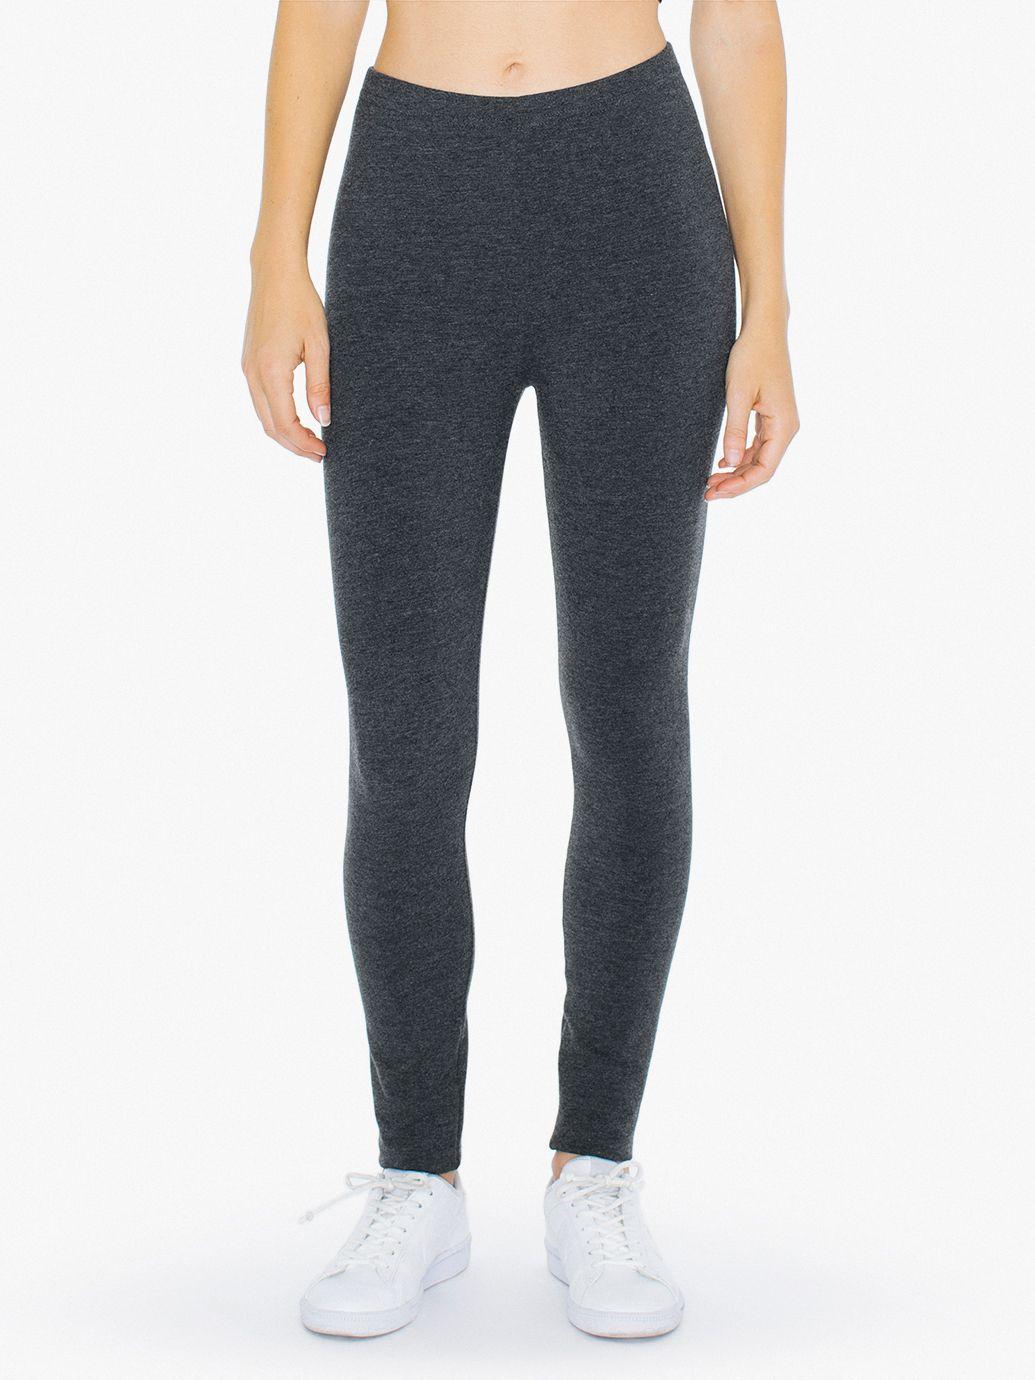 Cotton Spandex Jersey High-Waist Leggings | American Apparel